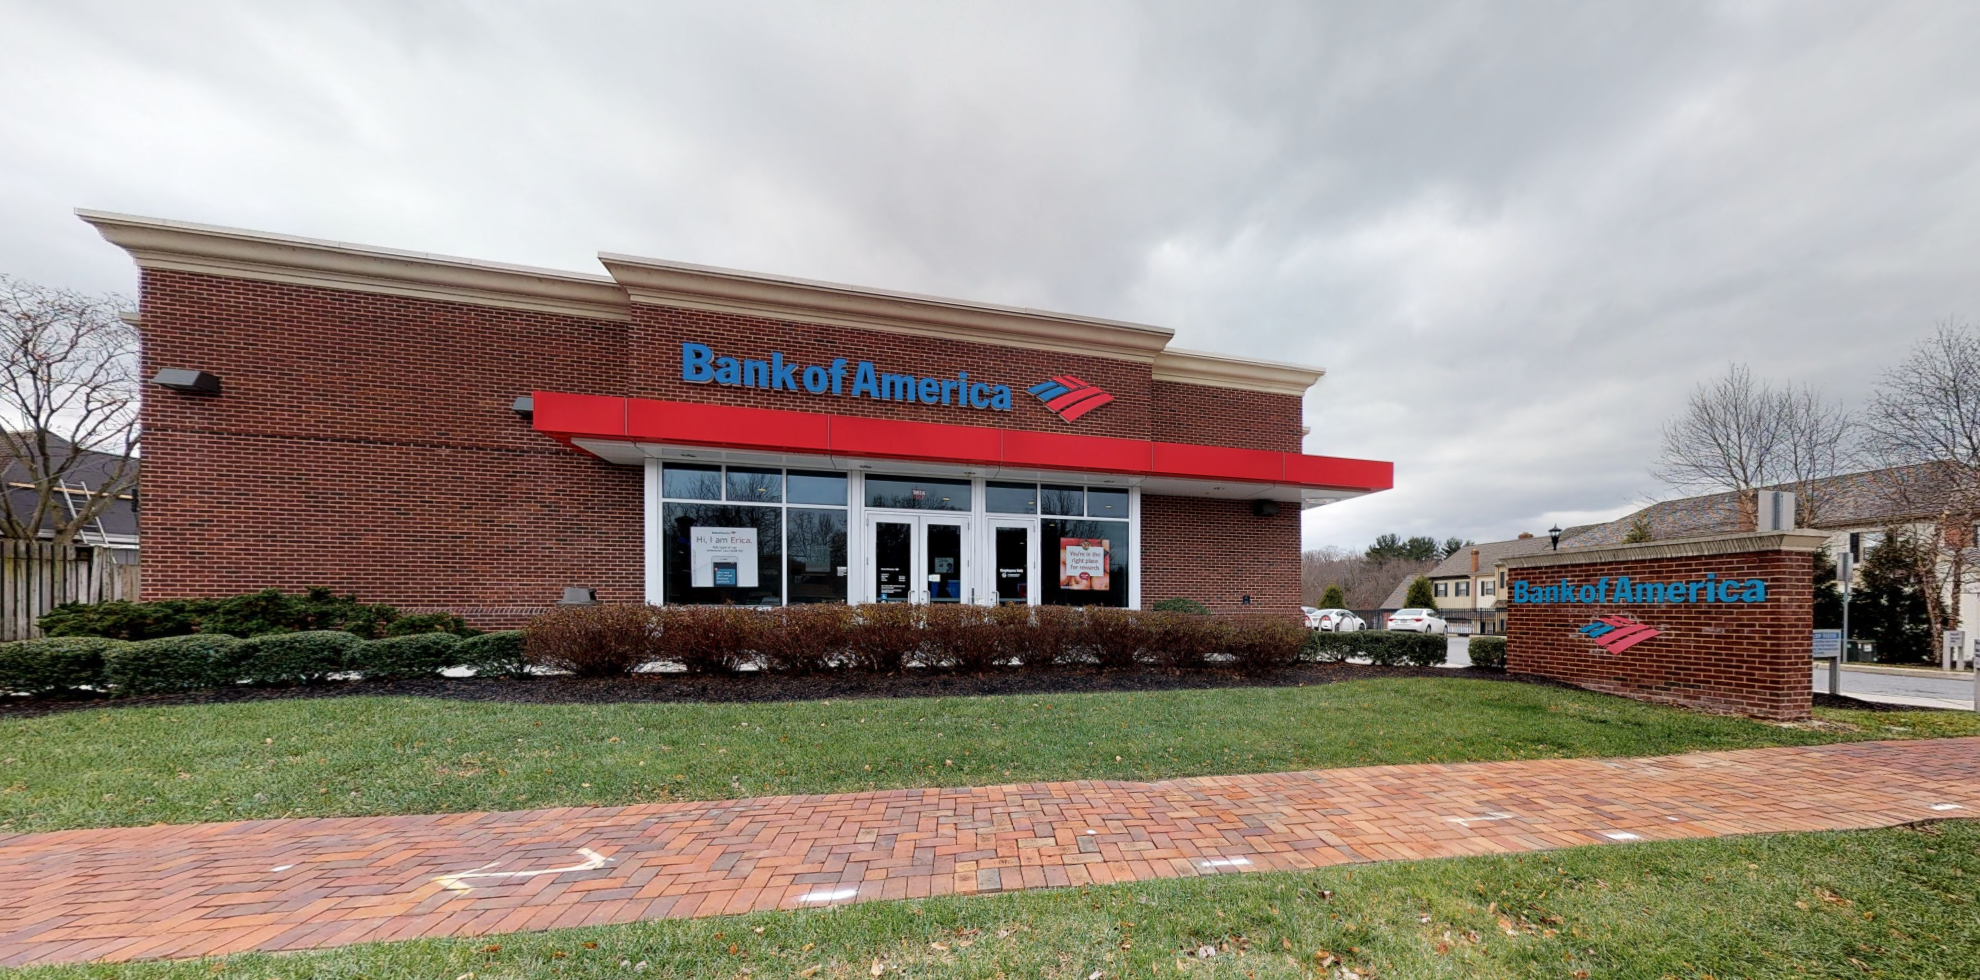 Bank of America financial center with drive-thru ATM   3816 Kennett Pike, Wilmington, DE 19807